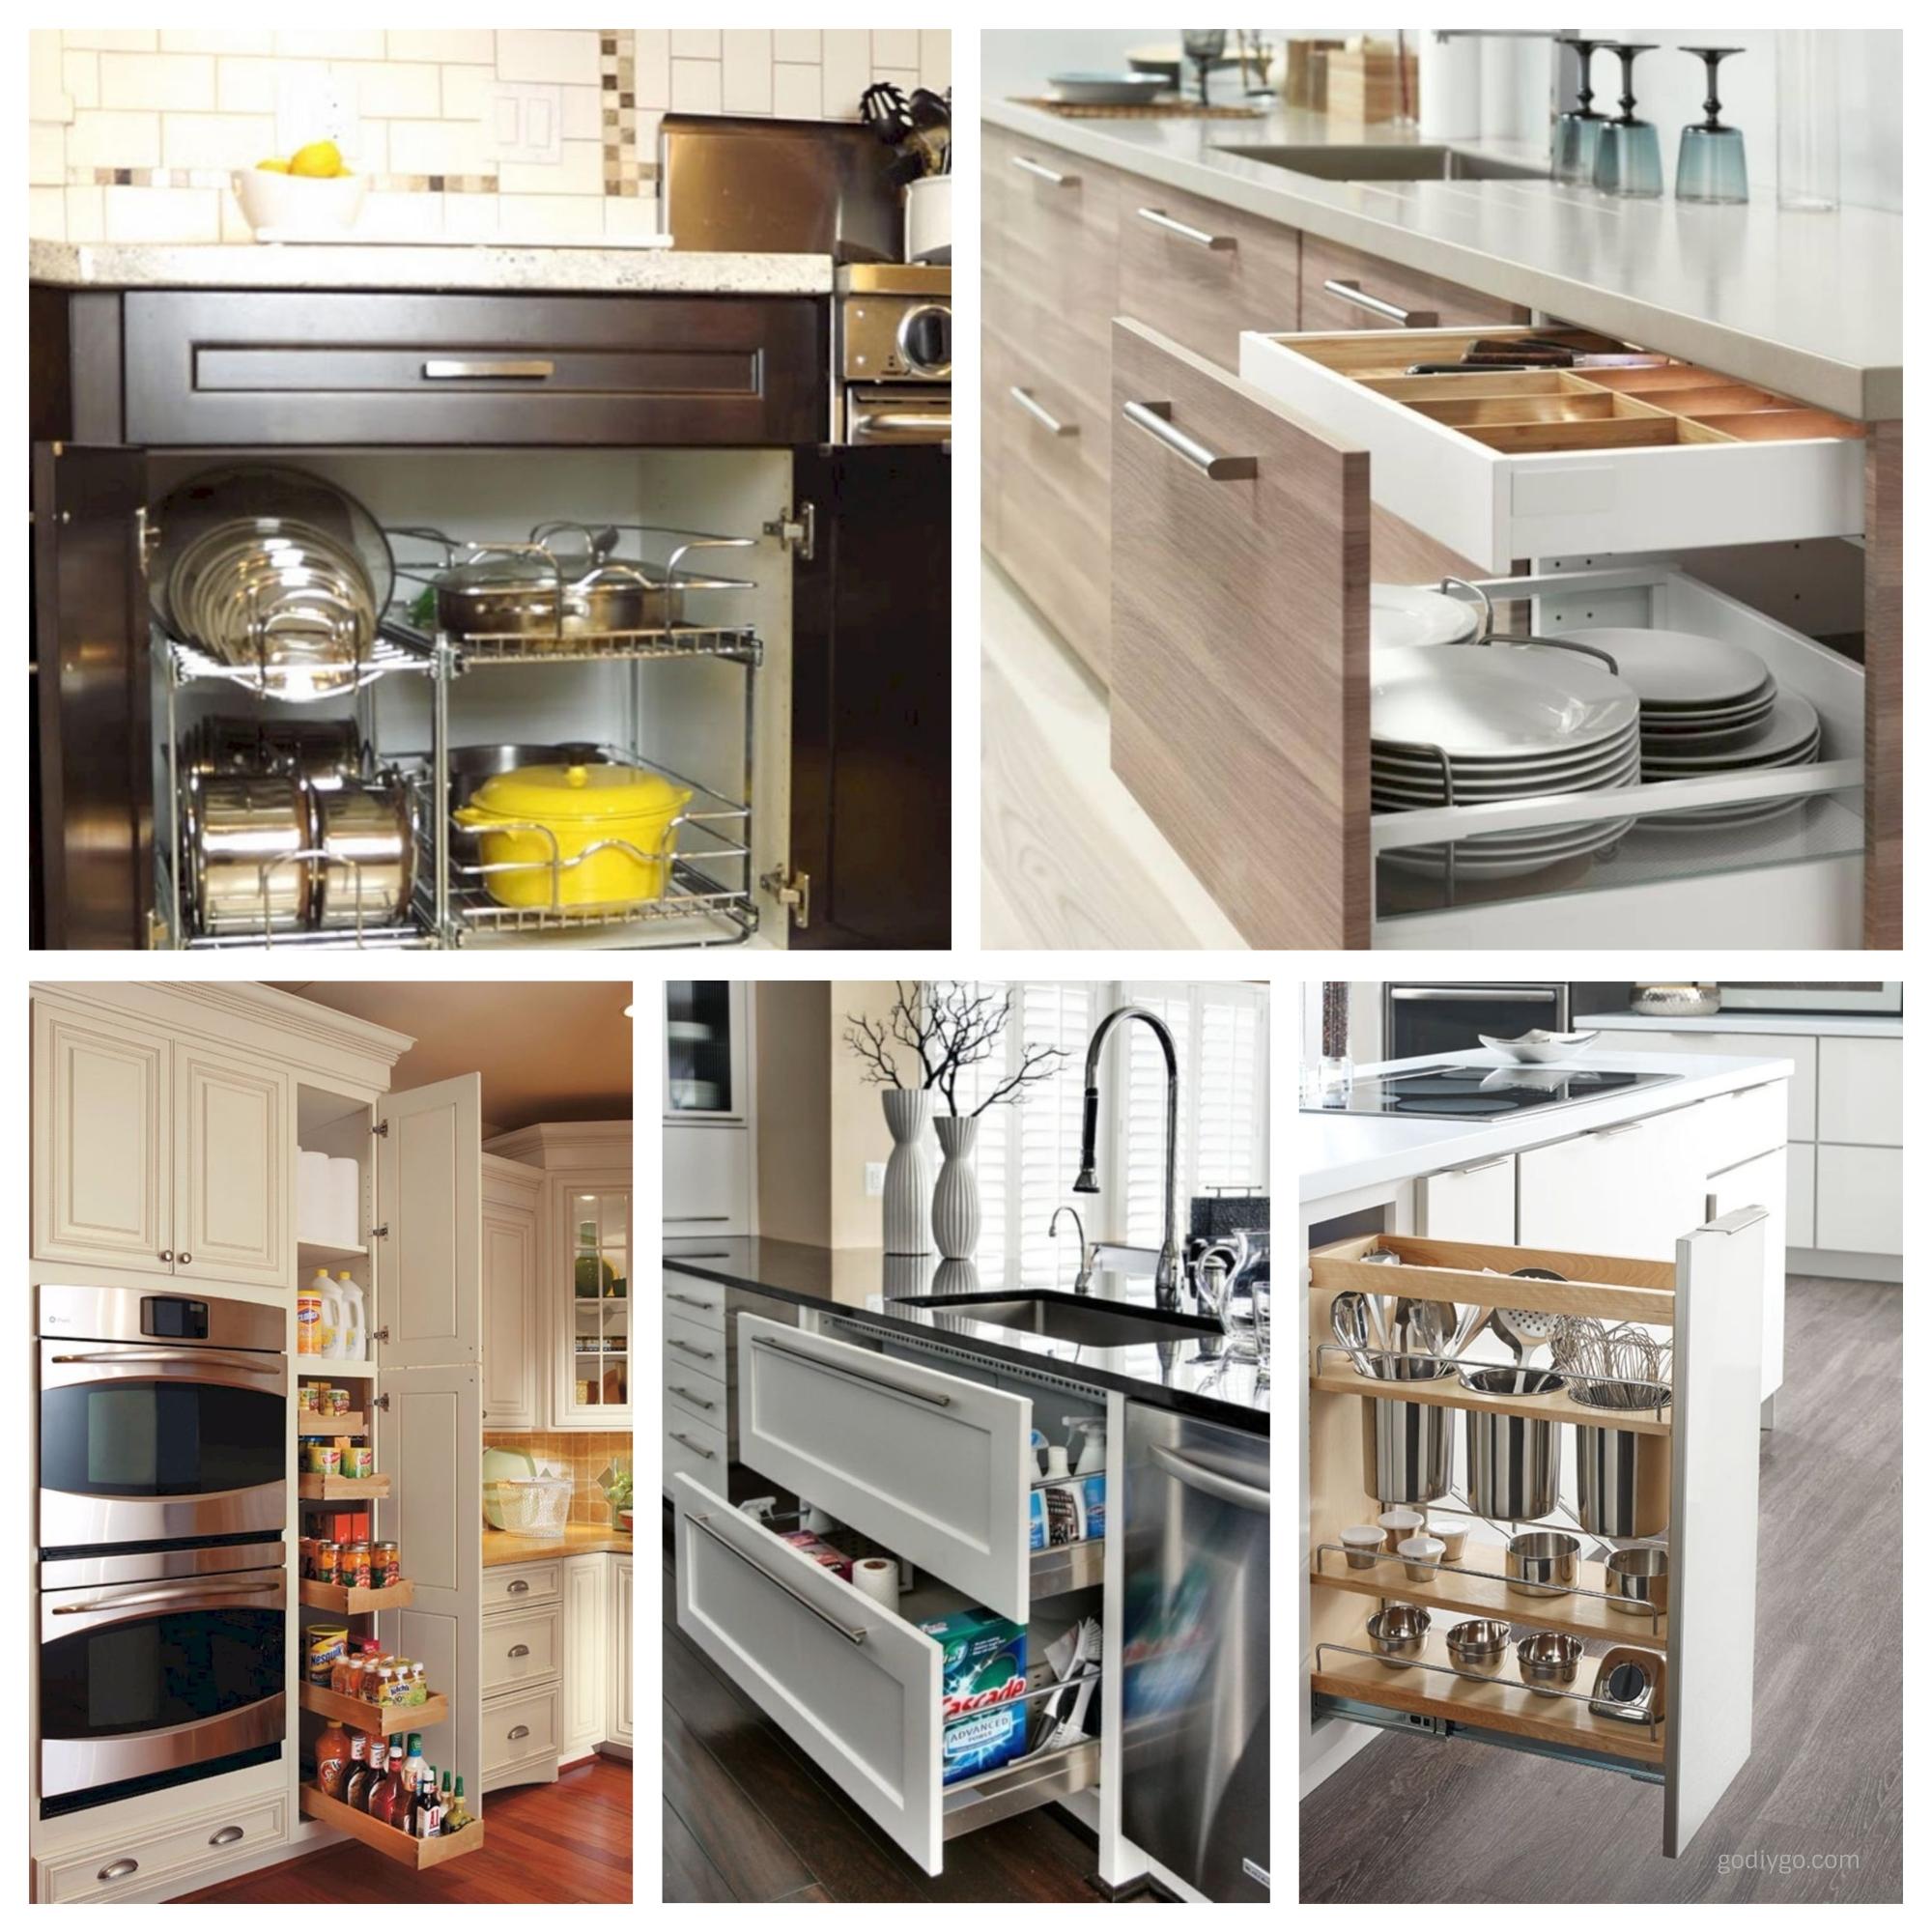 44 smart kitchen cabinet organization ideas godiygo com rh godiygo com